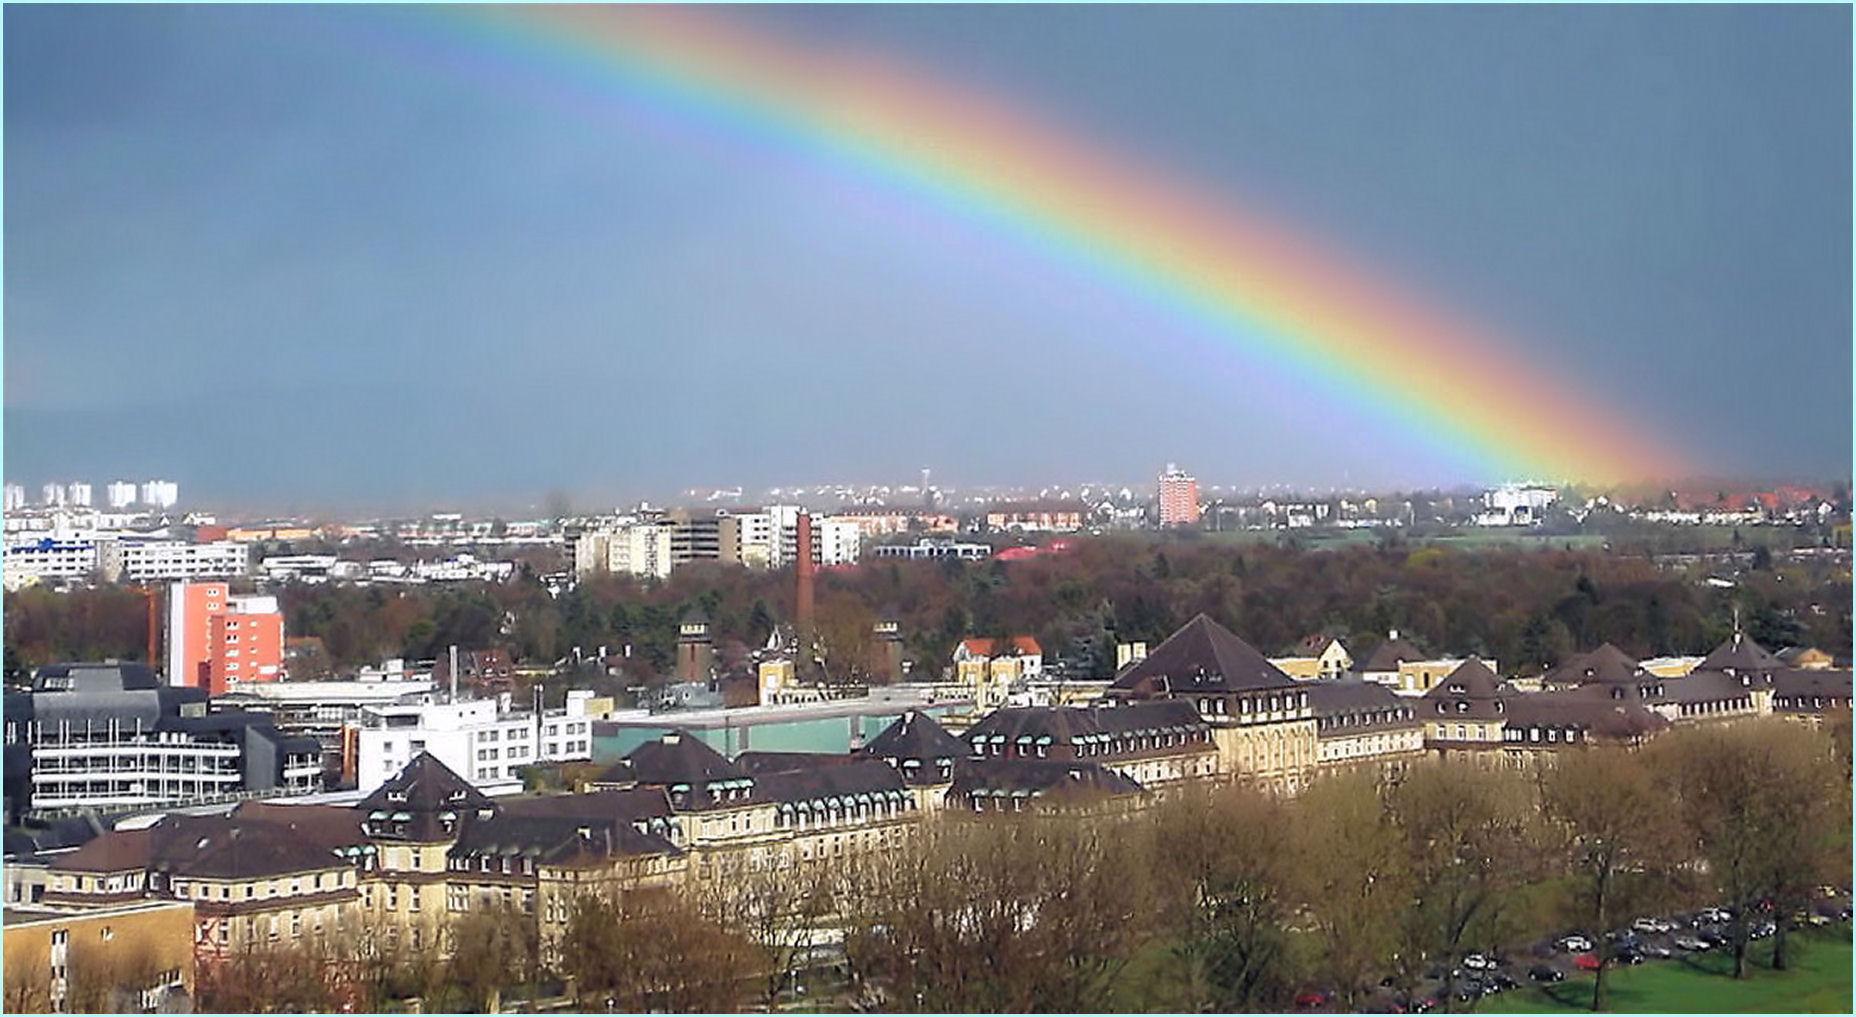 Regenbogen über dem Klinikum